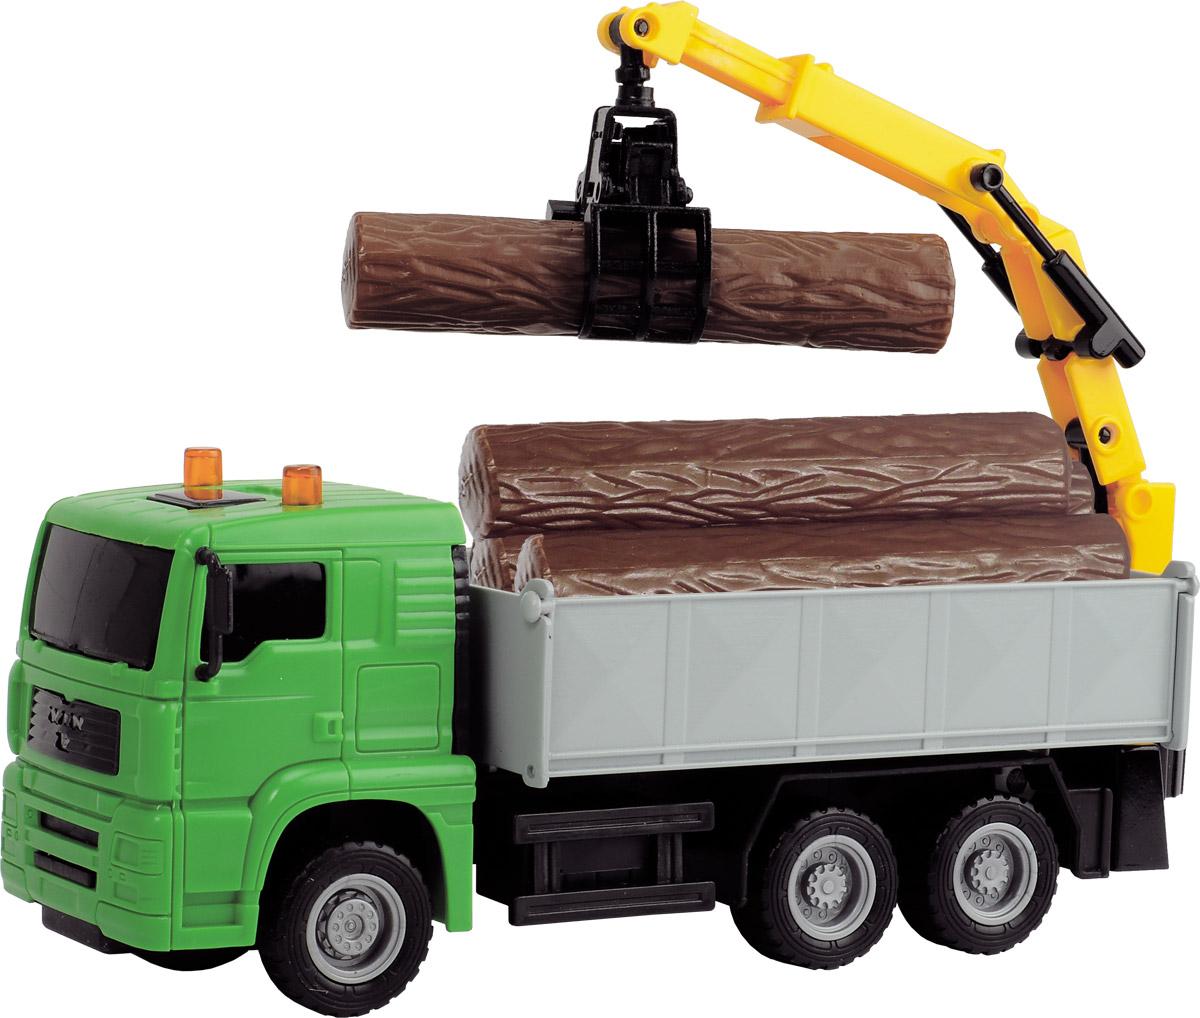 Dickie Toys Автокран Heavy City Truck цвет зеленый dickie toys dickie toys фрикционный джип 4 х 4 hill roader красный